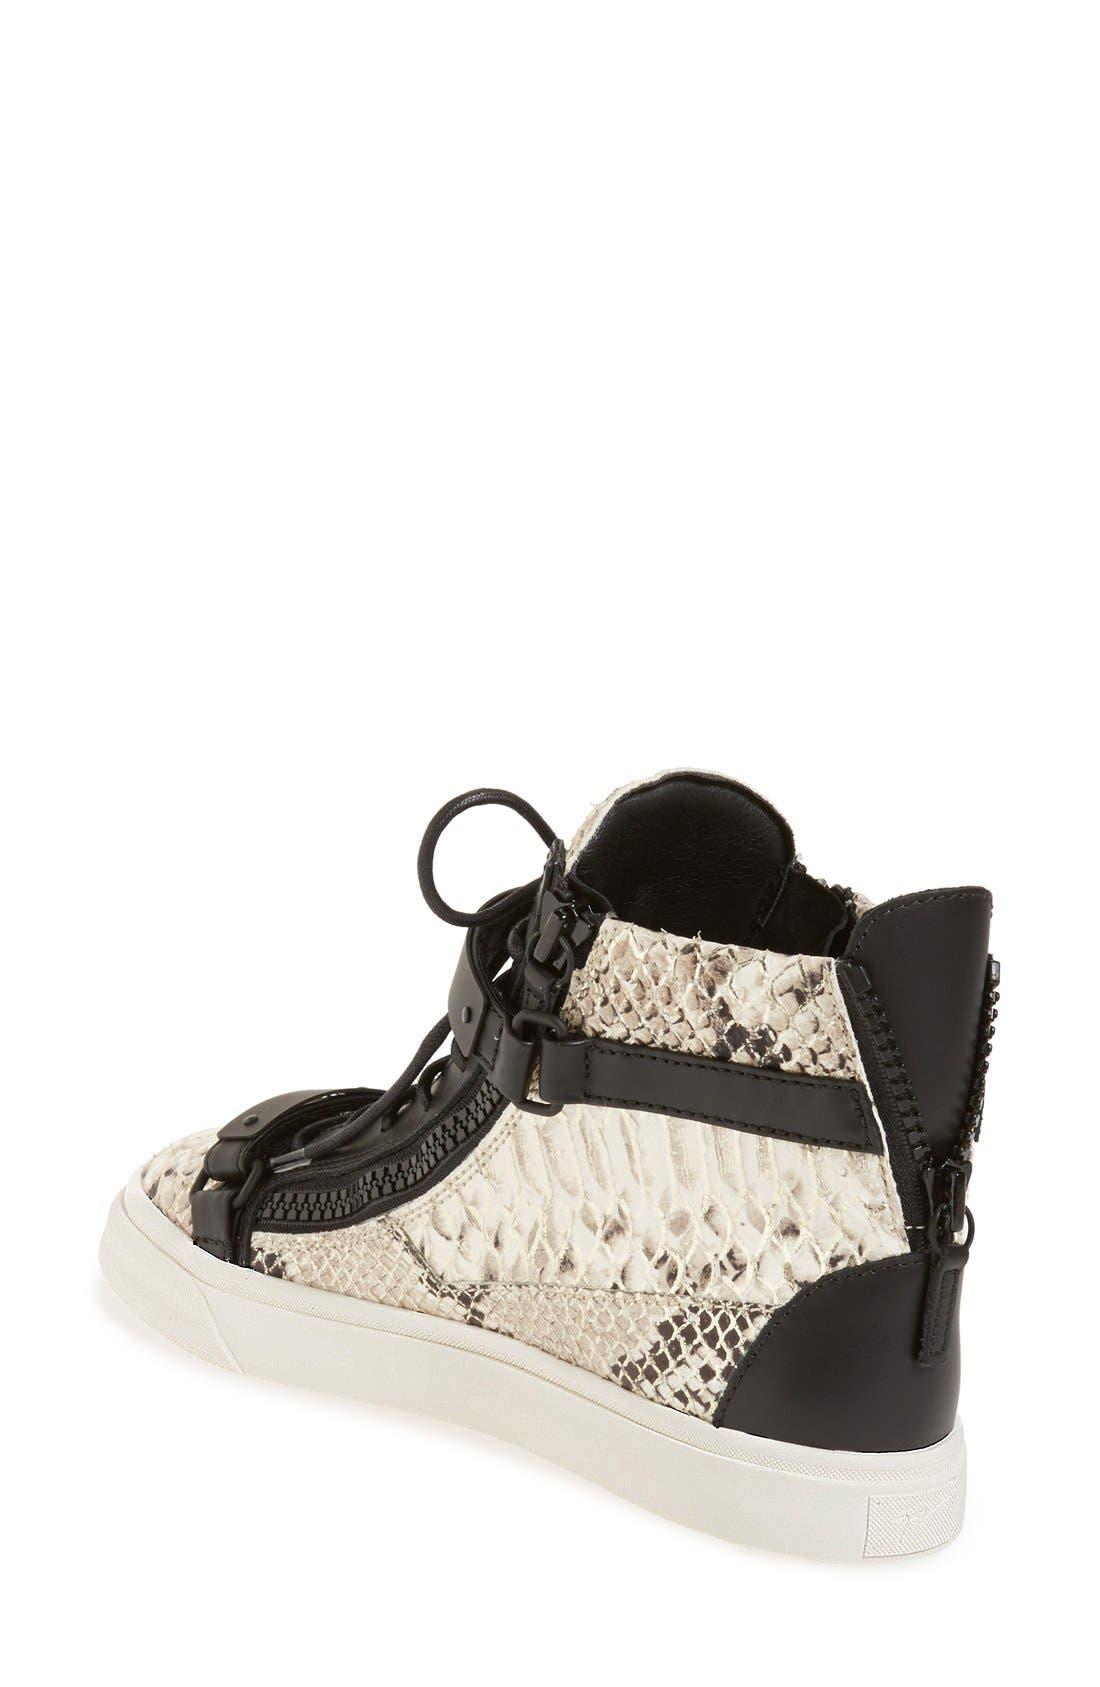 Alternate Image 2  - Giuseppe Zanotti 'London' High Top Sneaker (Women)